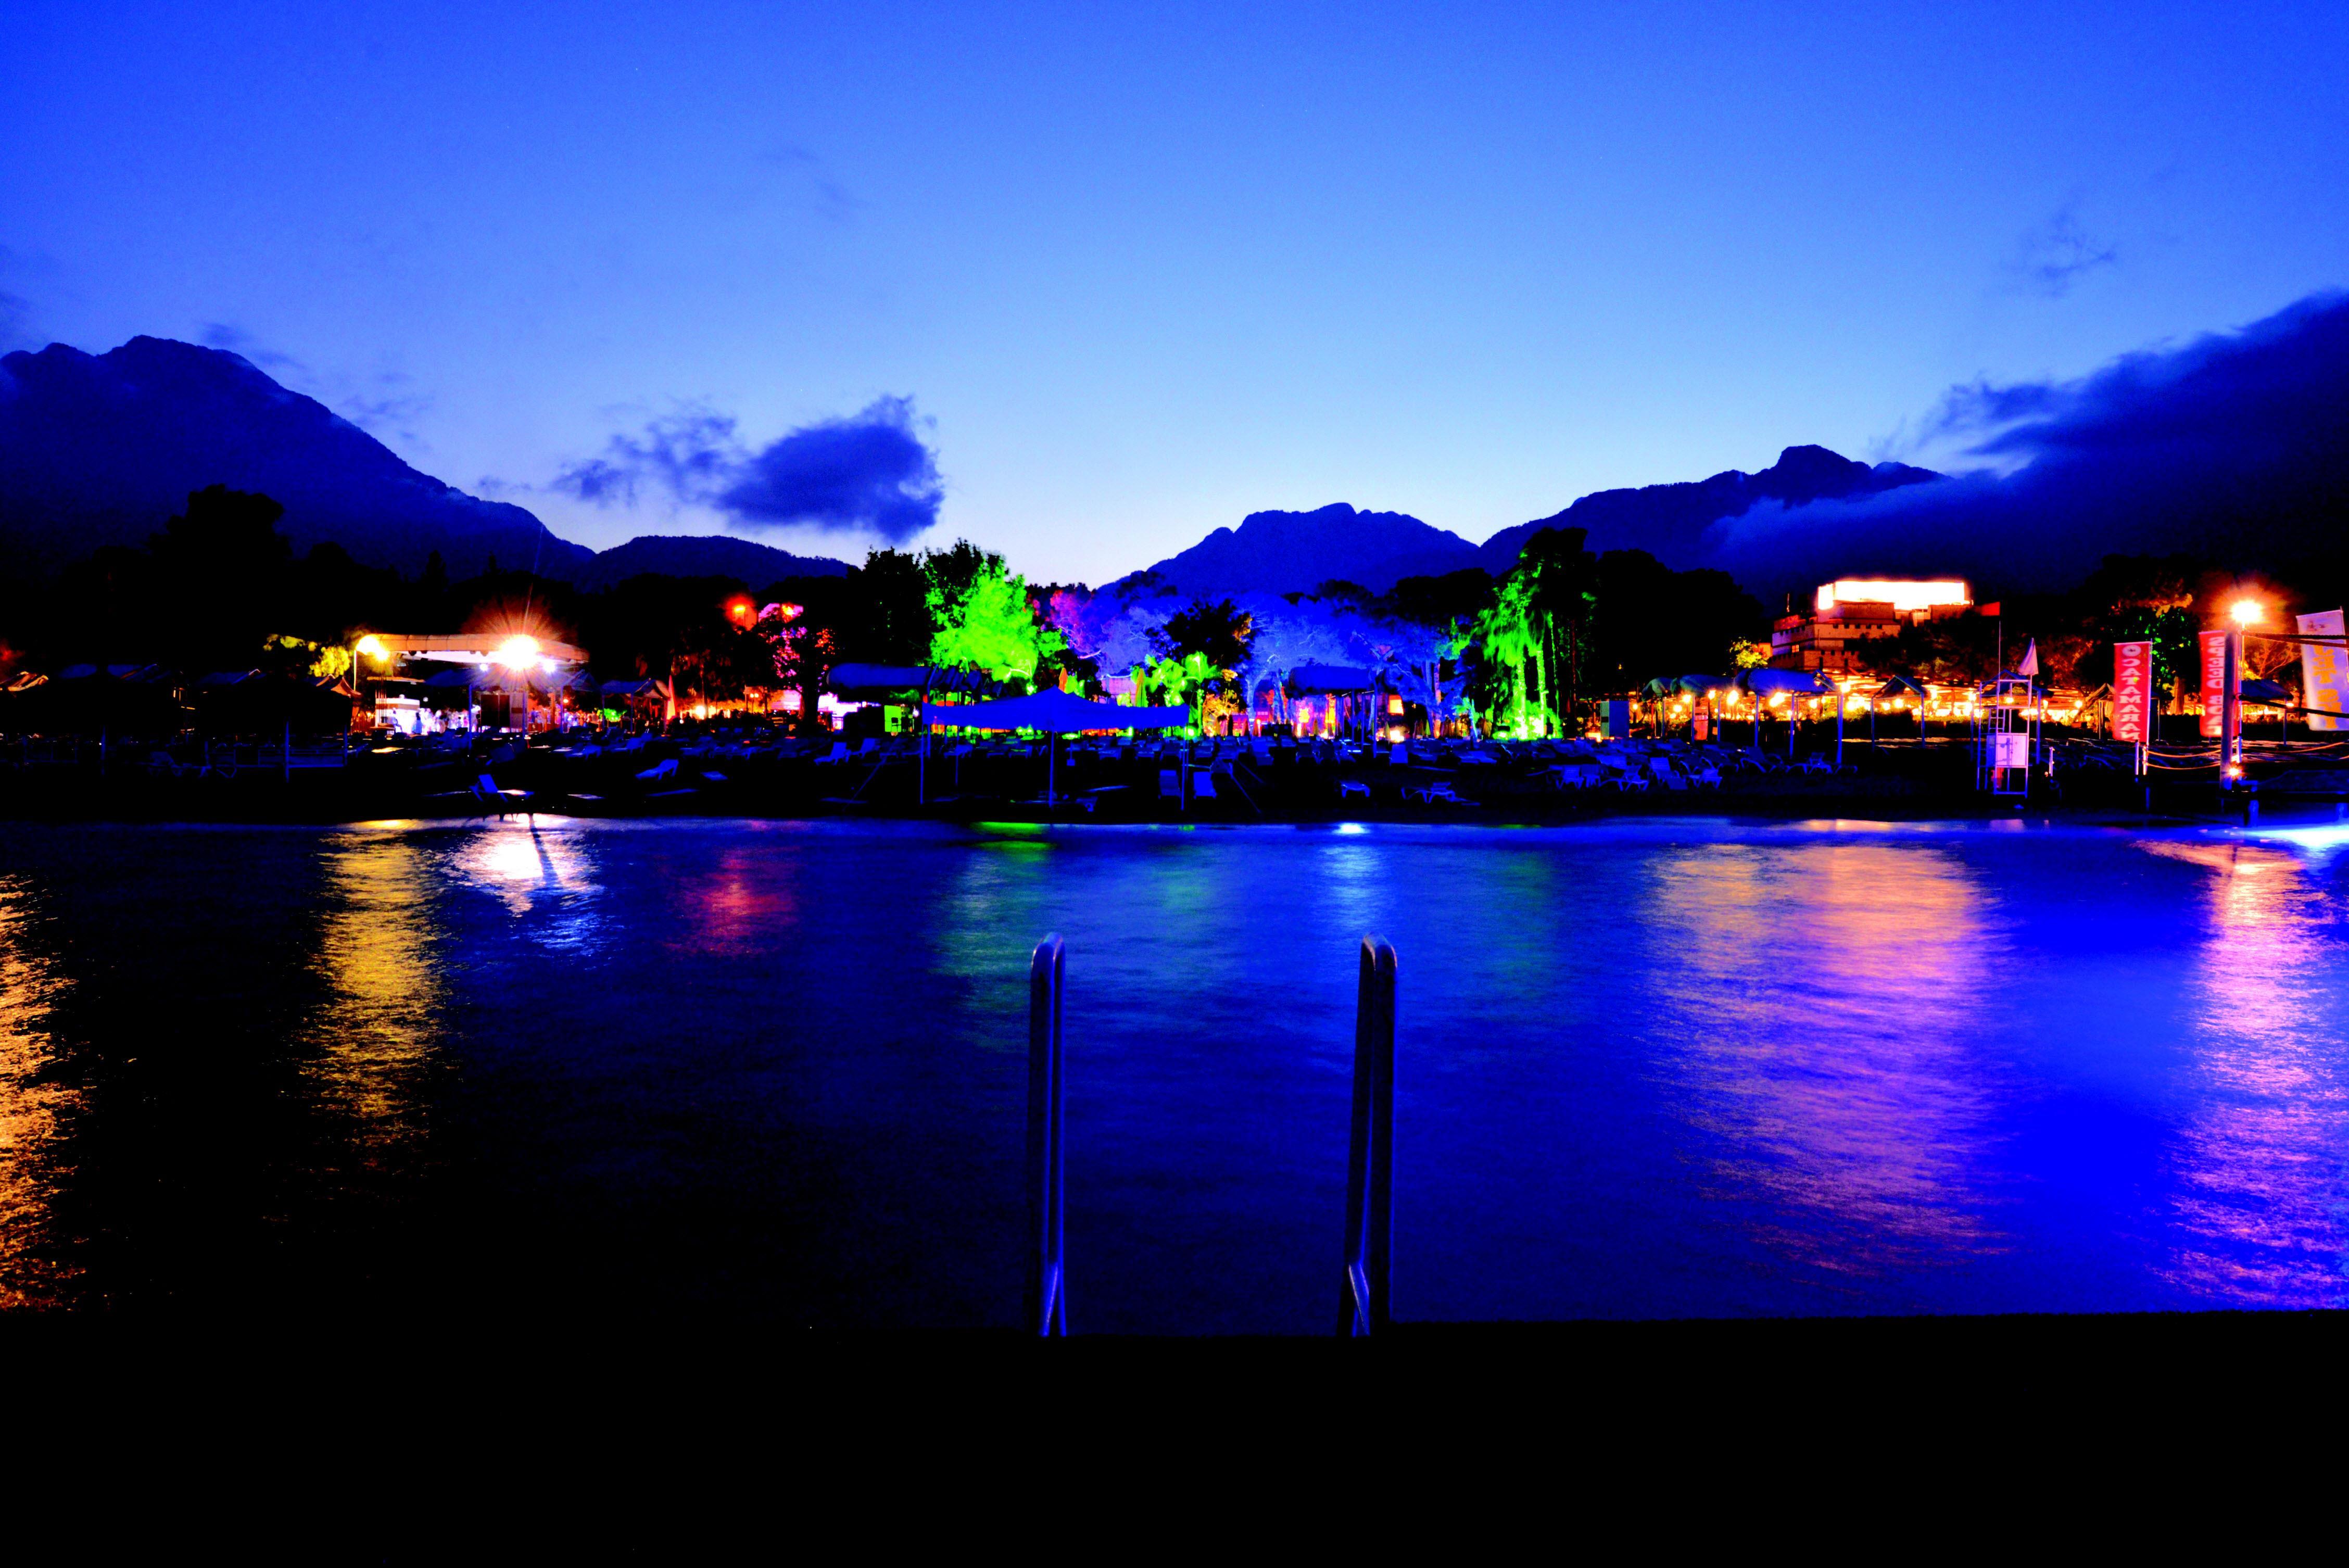 http://www.orextravel.sk/OREX/hotelphotos/ulusoy-kemer-holiday-club-area-0010.jpg